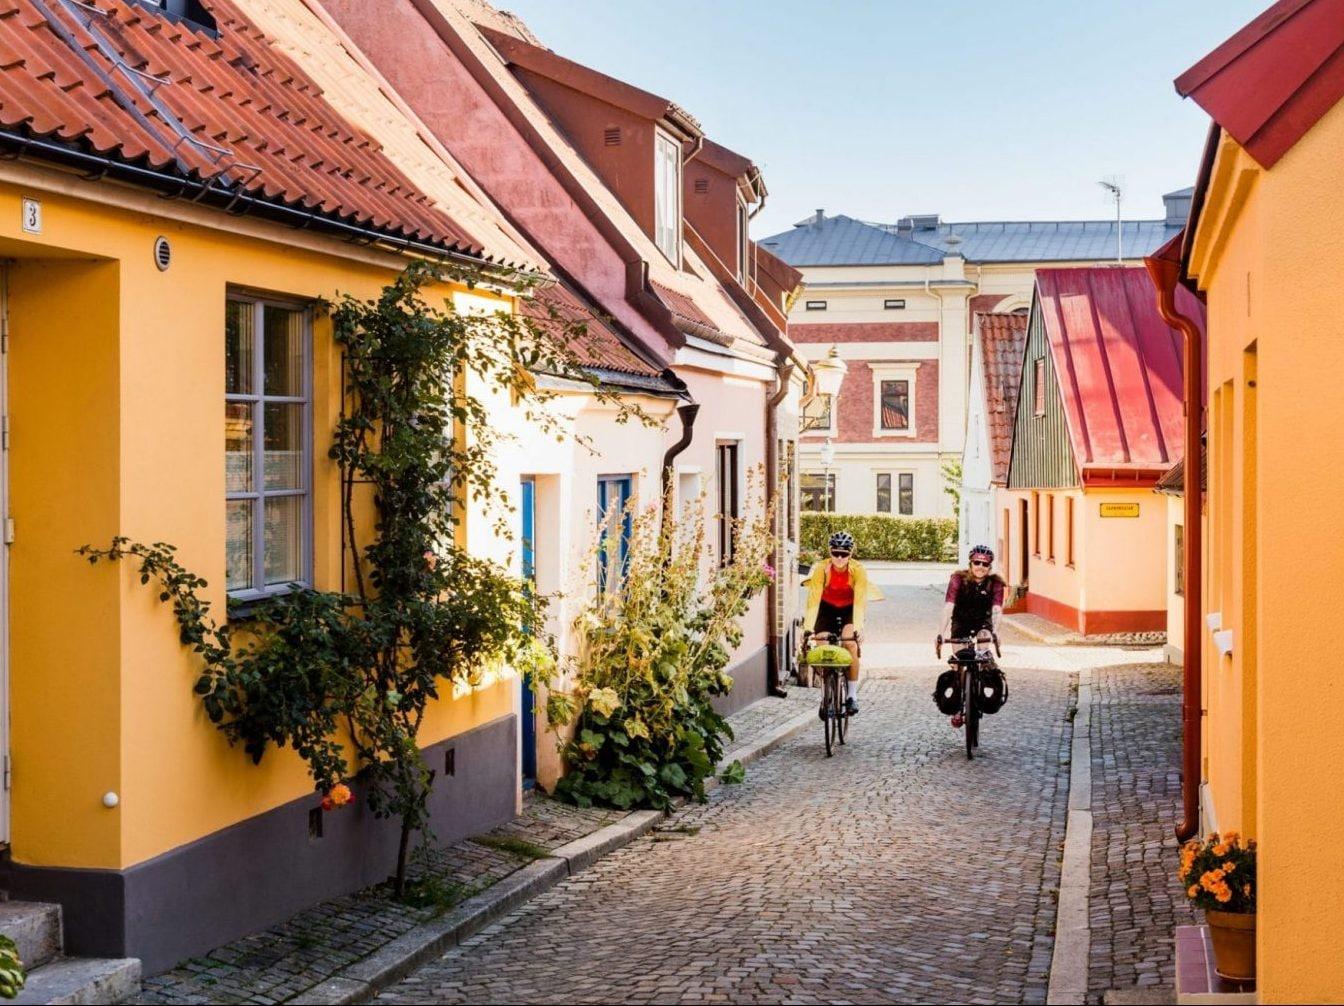 De Sydkustleden in Zweden